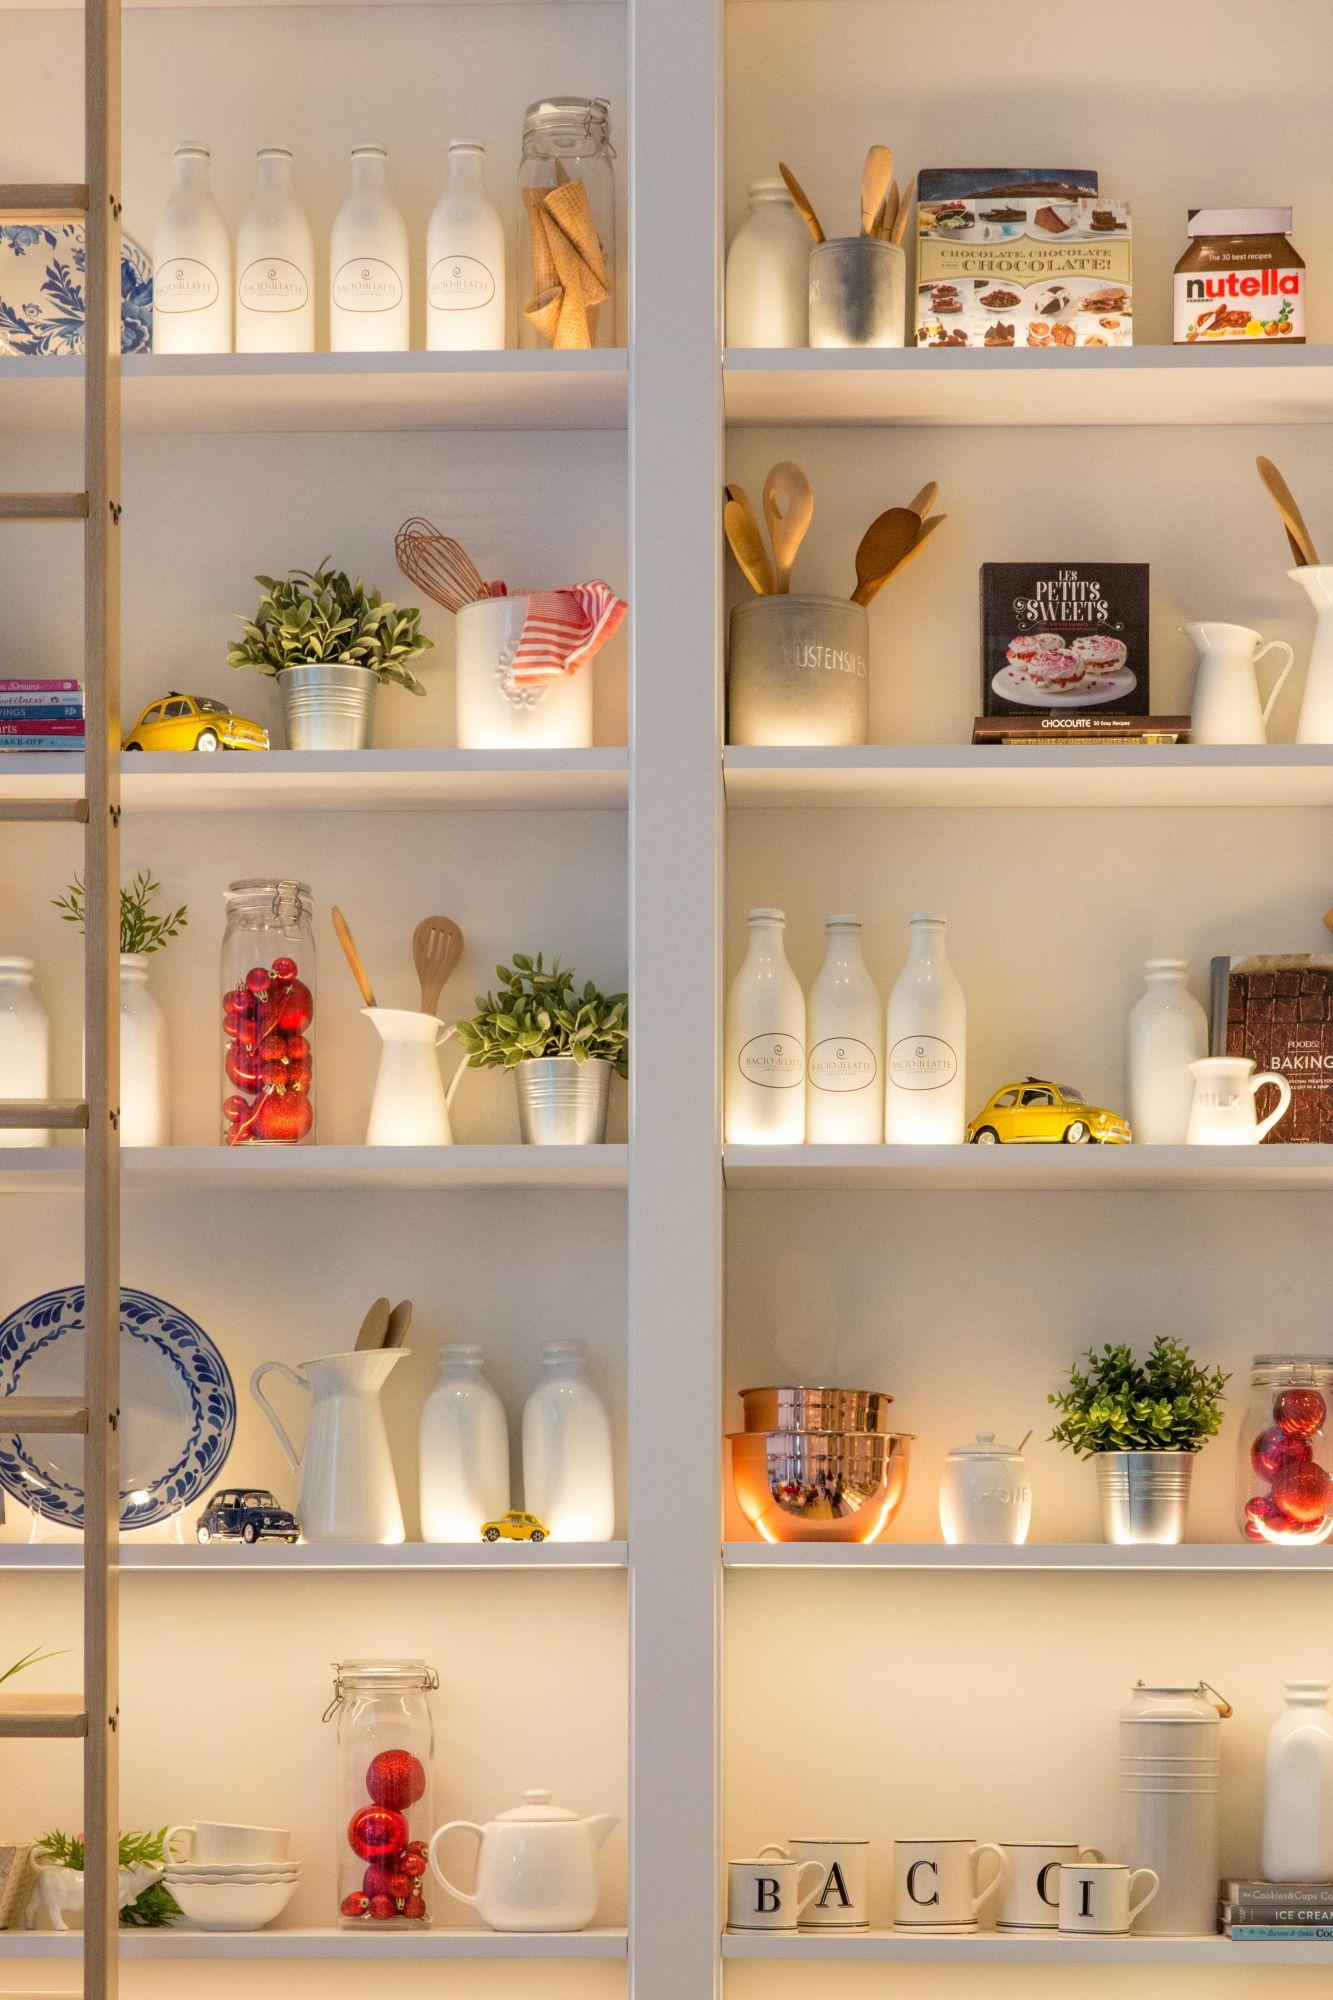 Credenza in cucina: illuminata a vista